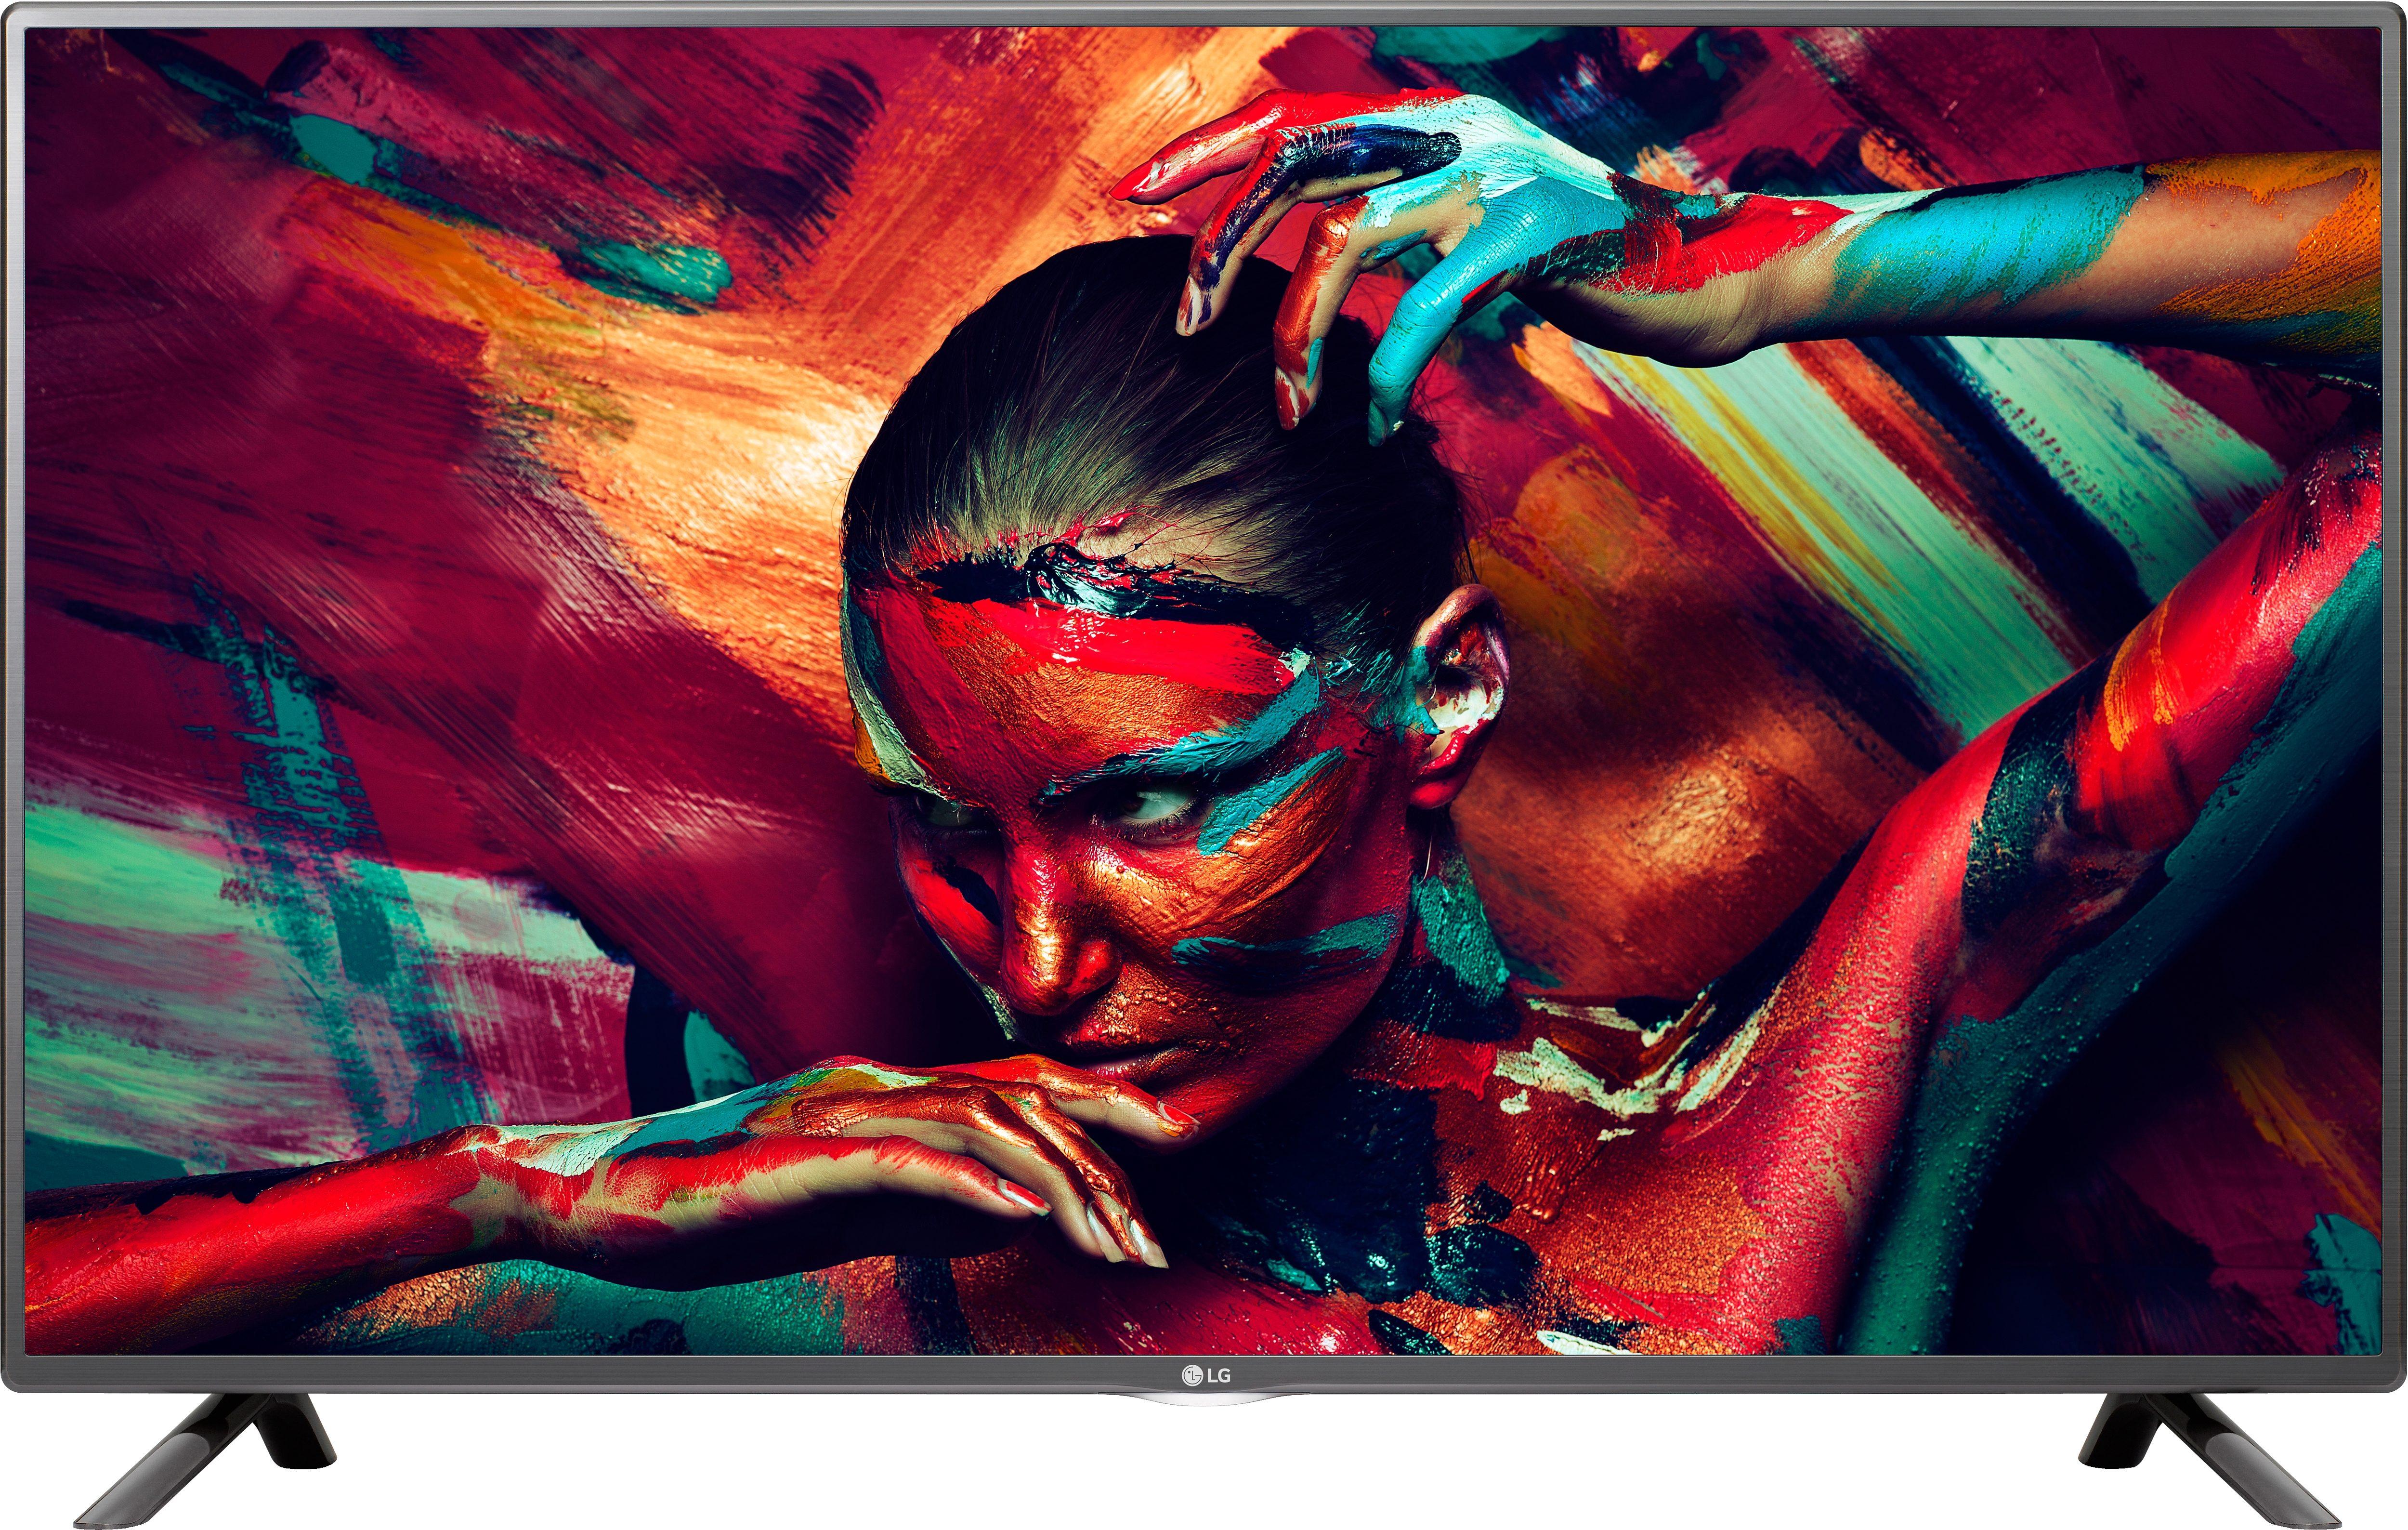 LG 50LF5809, LED Fernseher, 126 cm (50 Zoll), 1080p (Full HD), Smart-TV